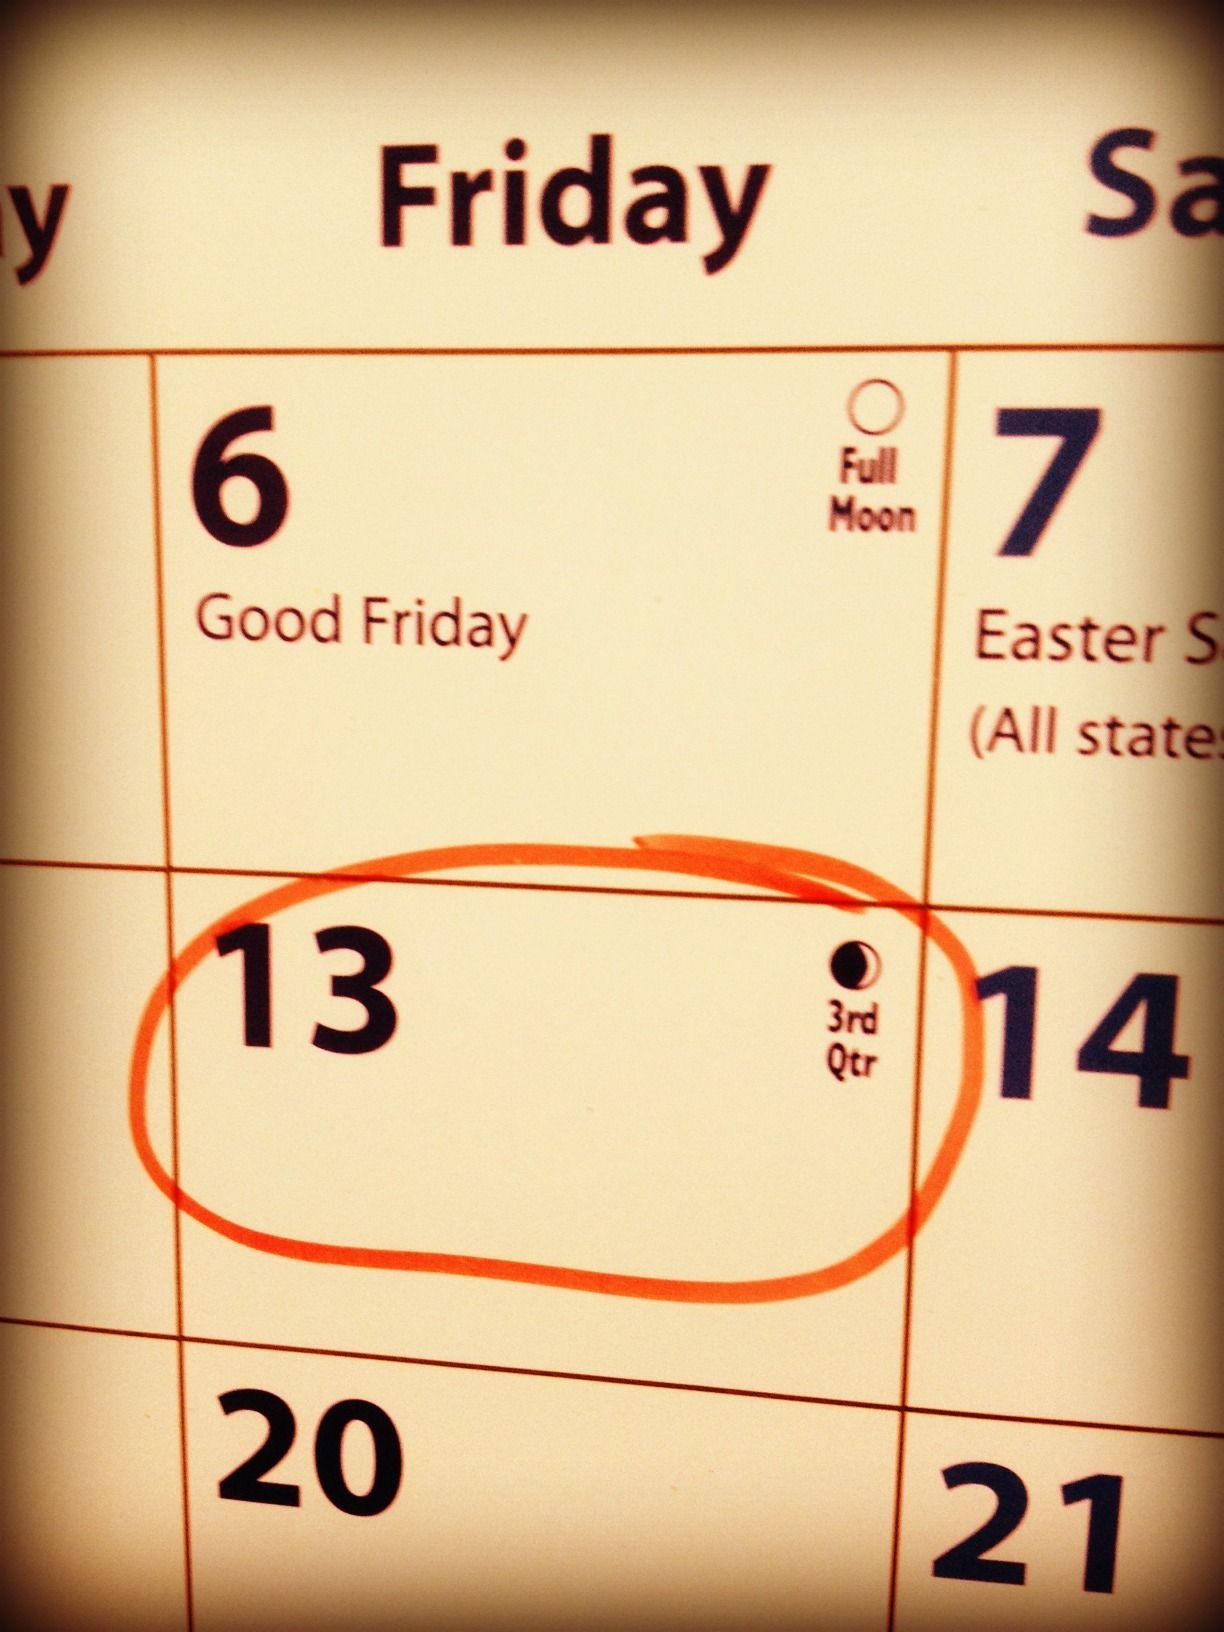 It's Friday The 13th Shambolic Living